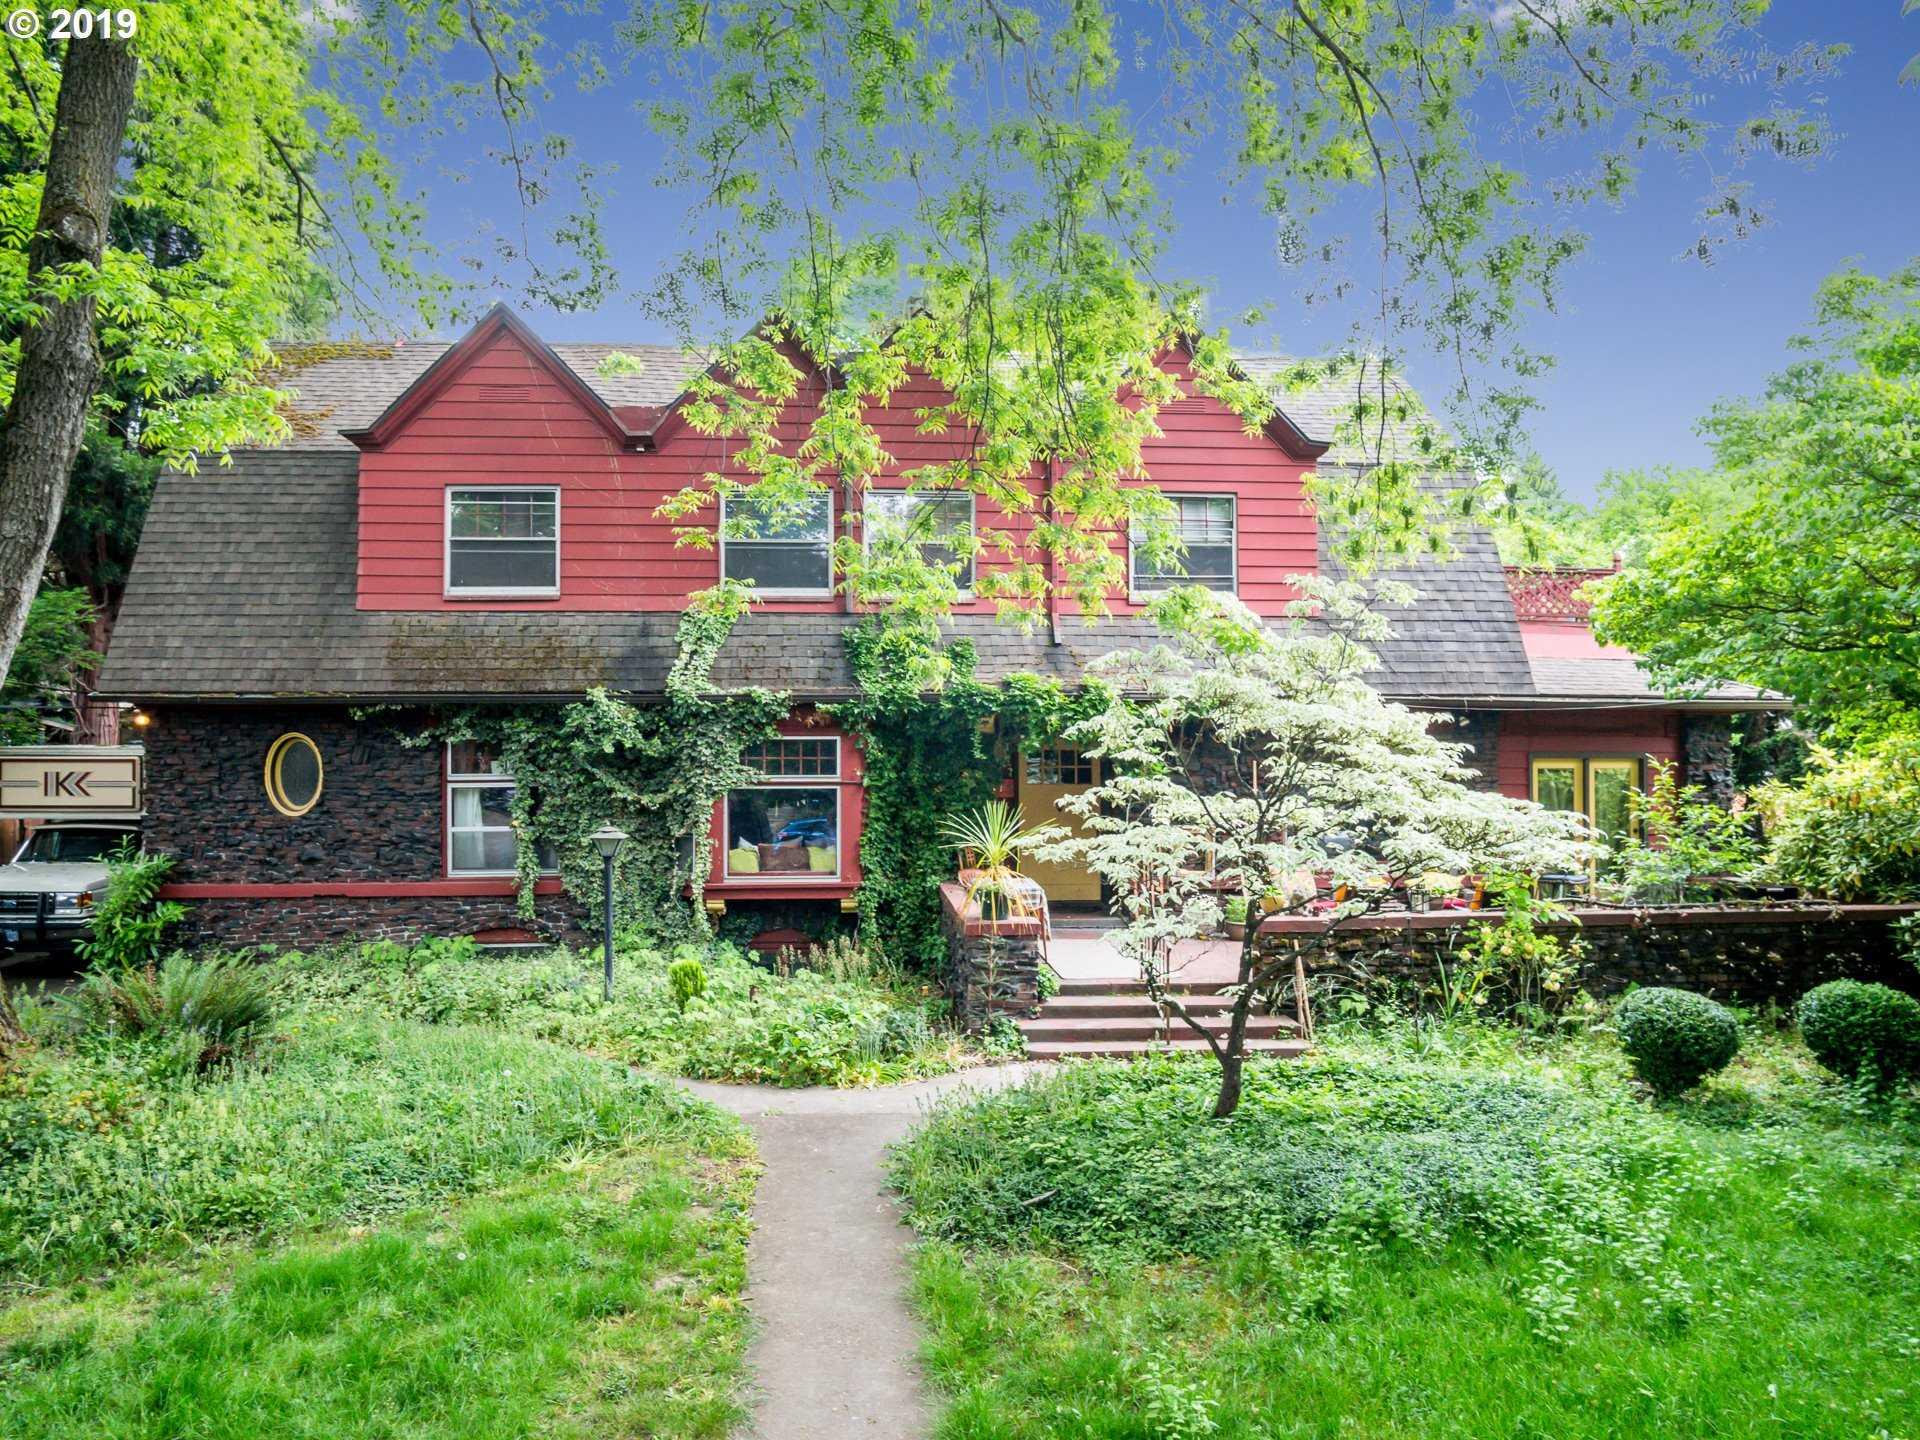 $986,400 - 4Br/4Ba -  for Sale in Irvington, Portland